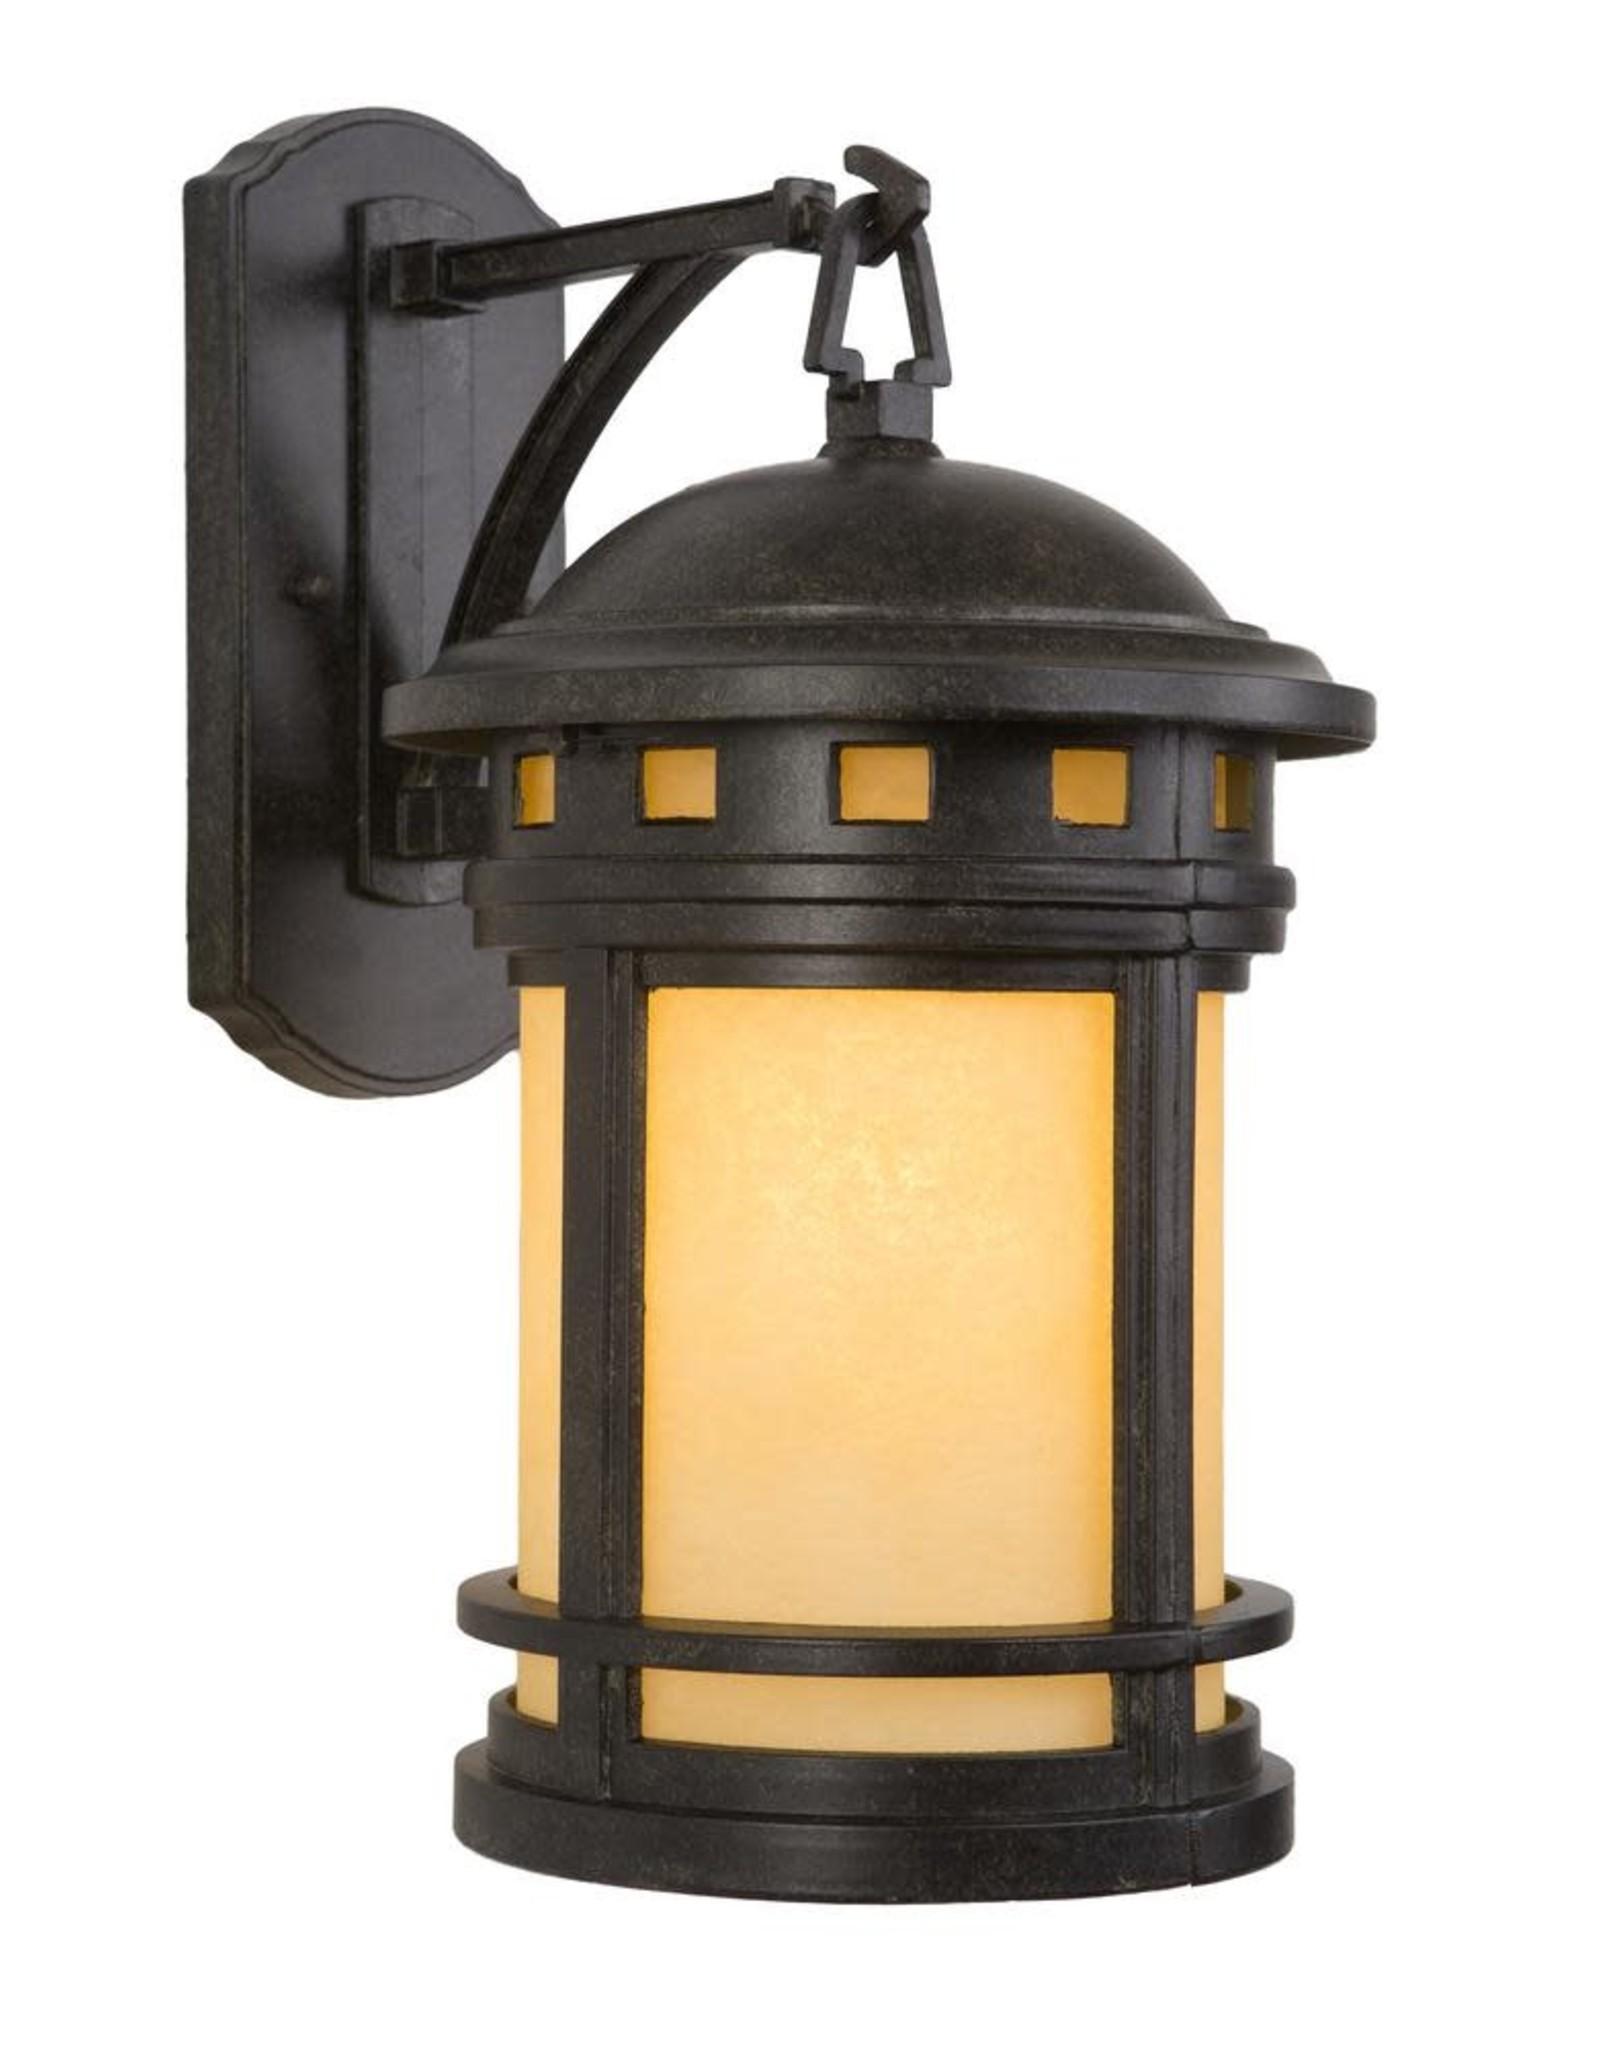 Yosemite Home Decor Sahara Collection 1-Light Desert Night Outdoor Wall Lantern Sconce